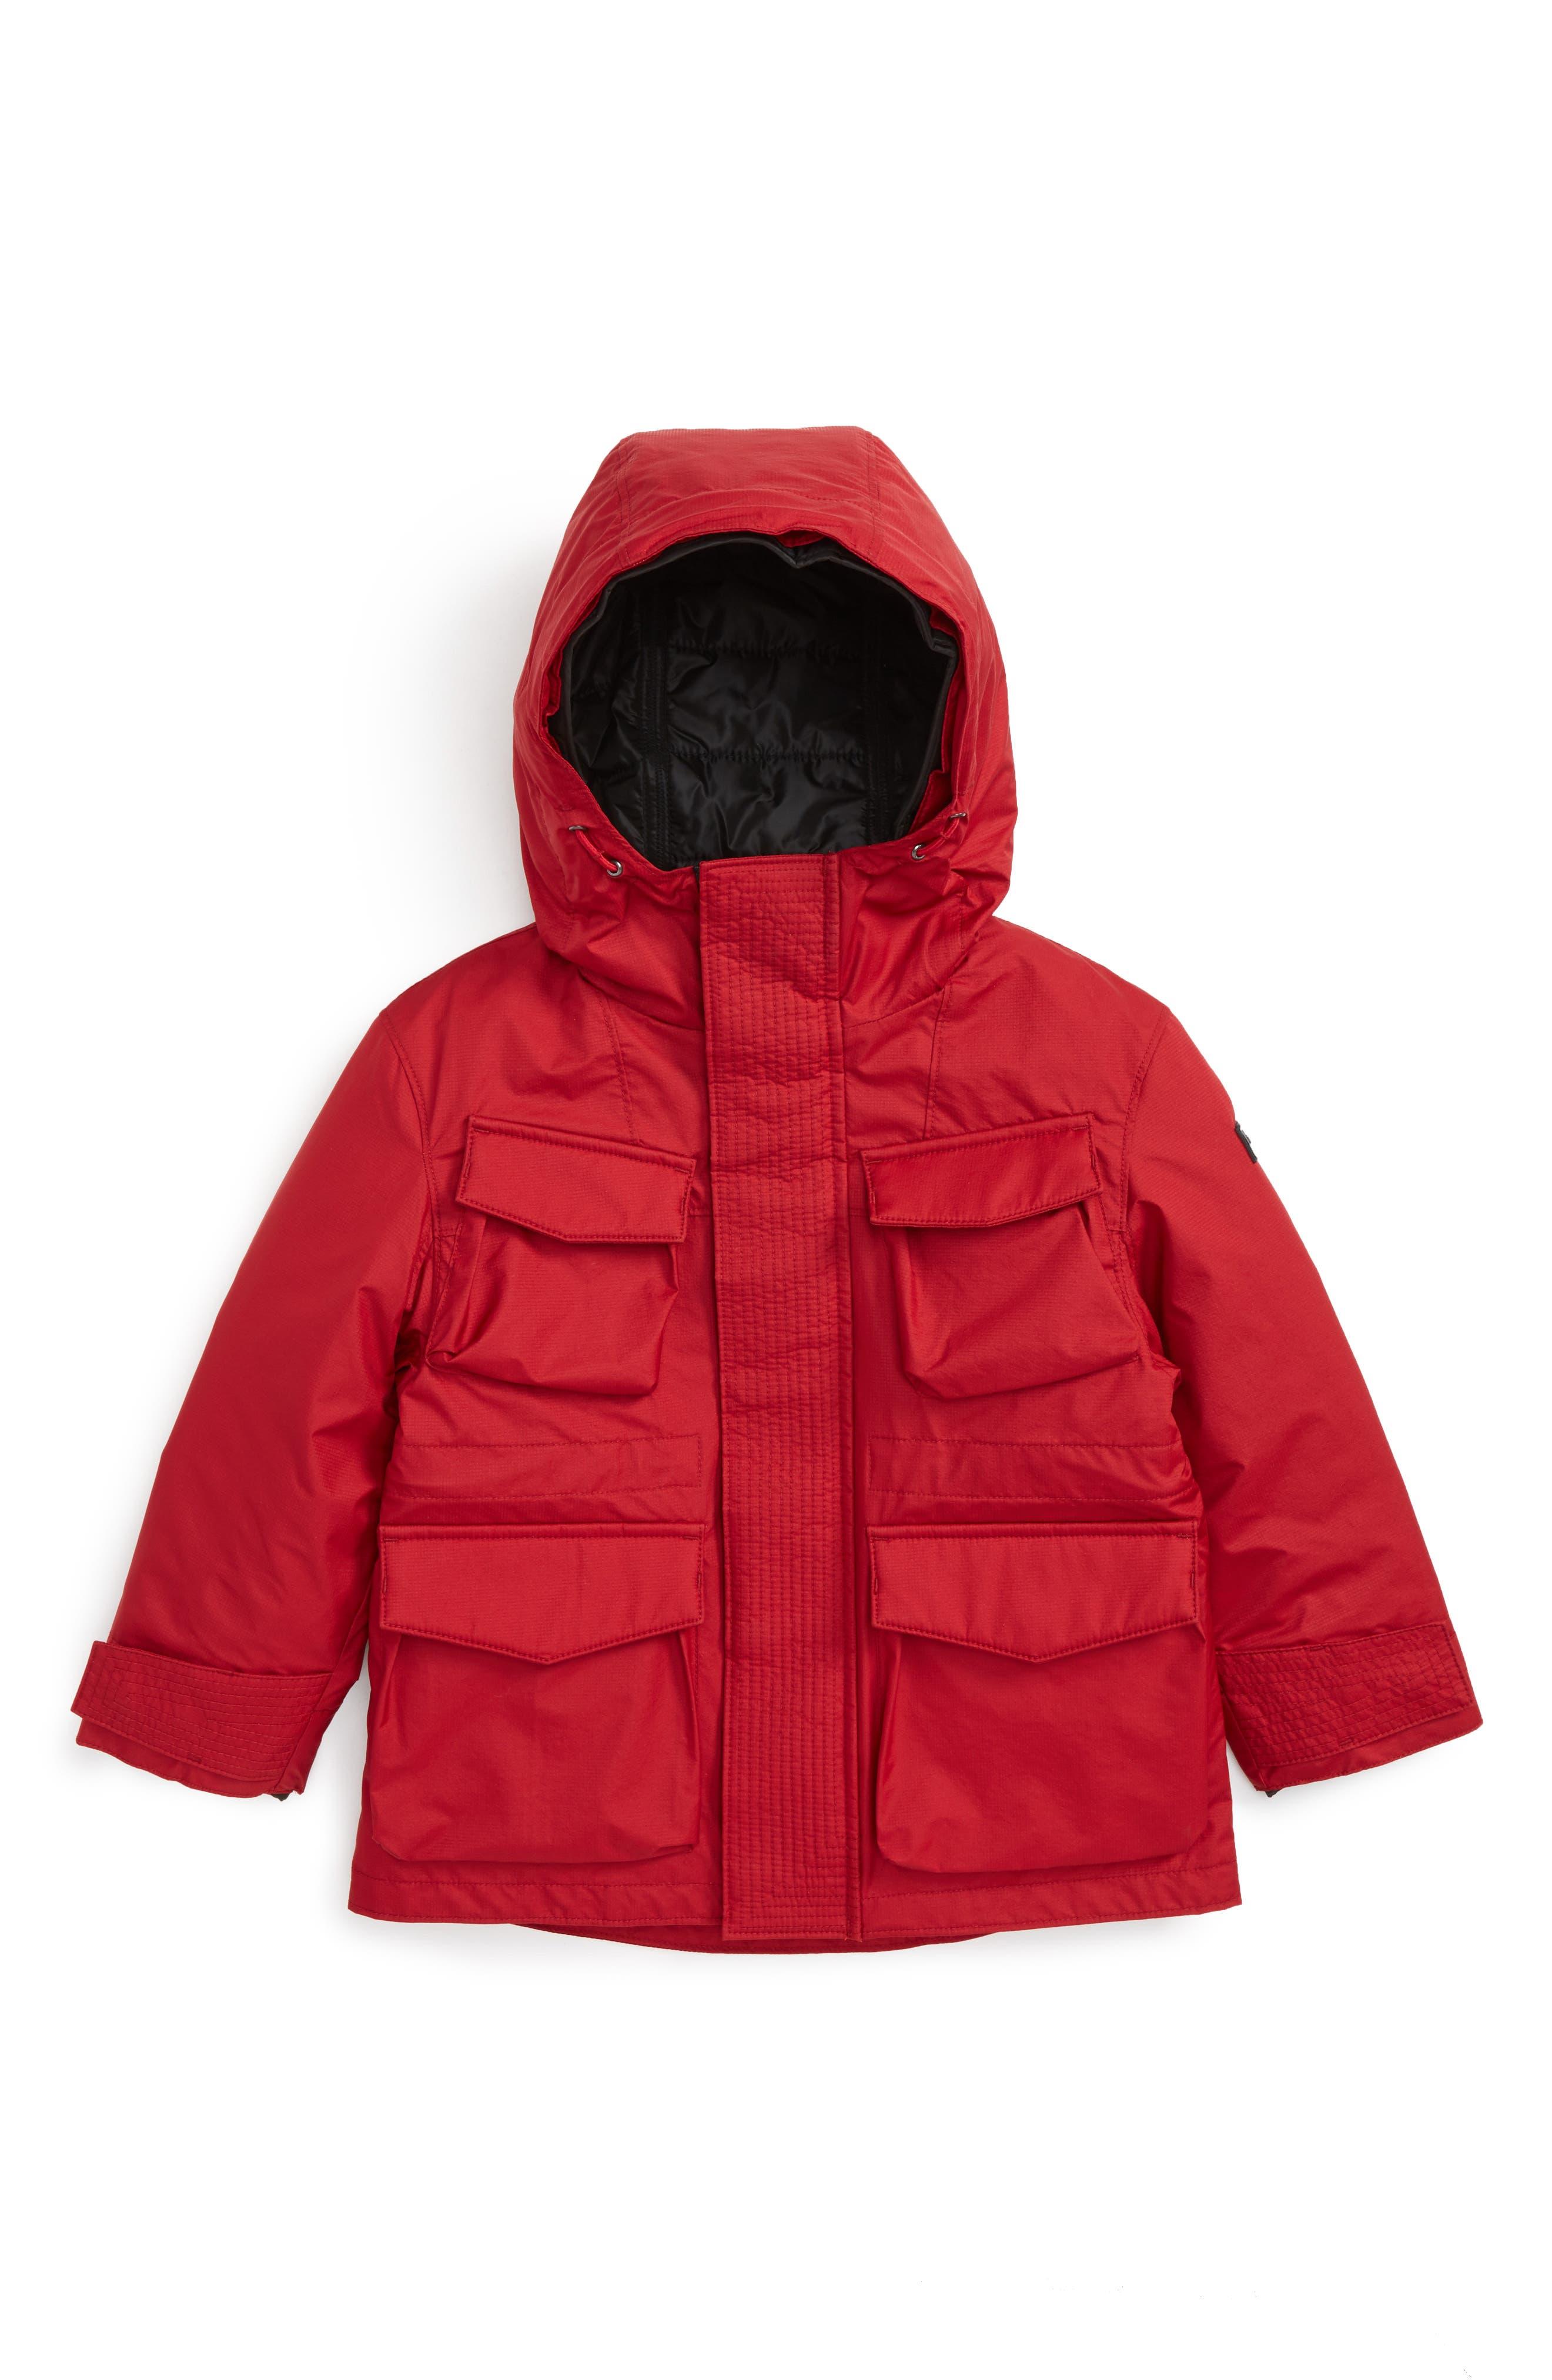 Terrick 3-in-1 Jacket,                             Main thumbnail 1, color,                             Parade Red